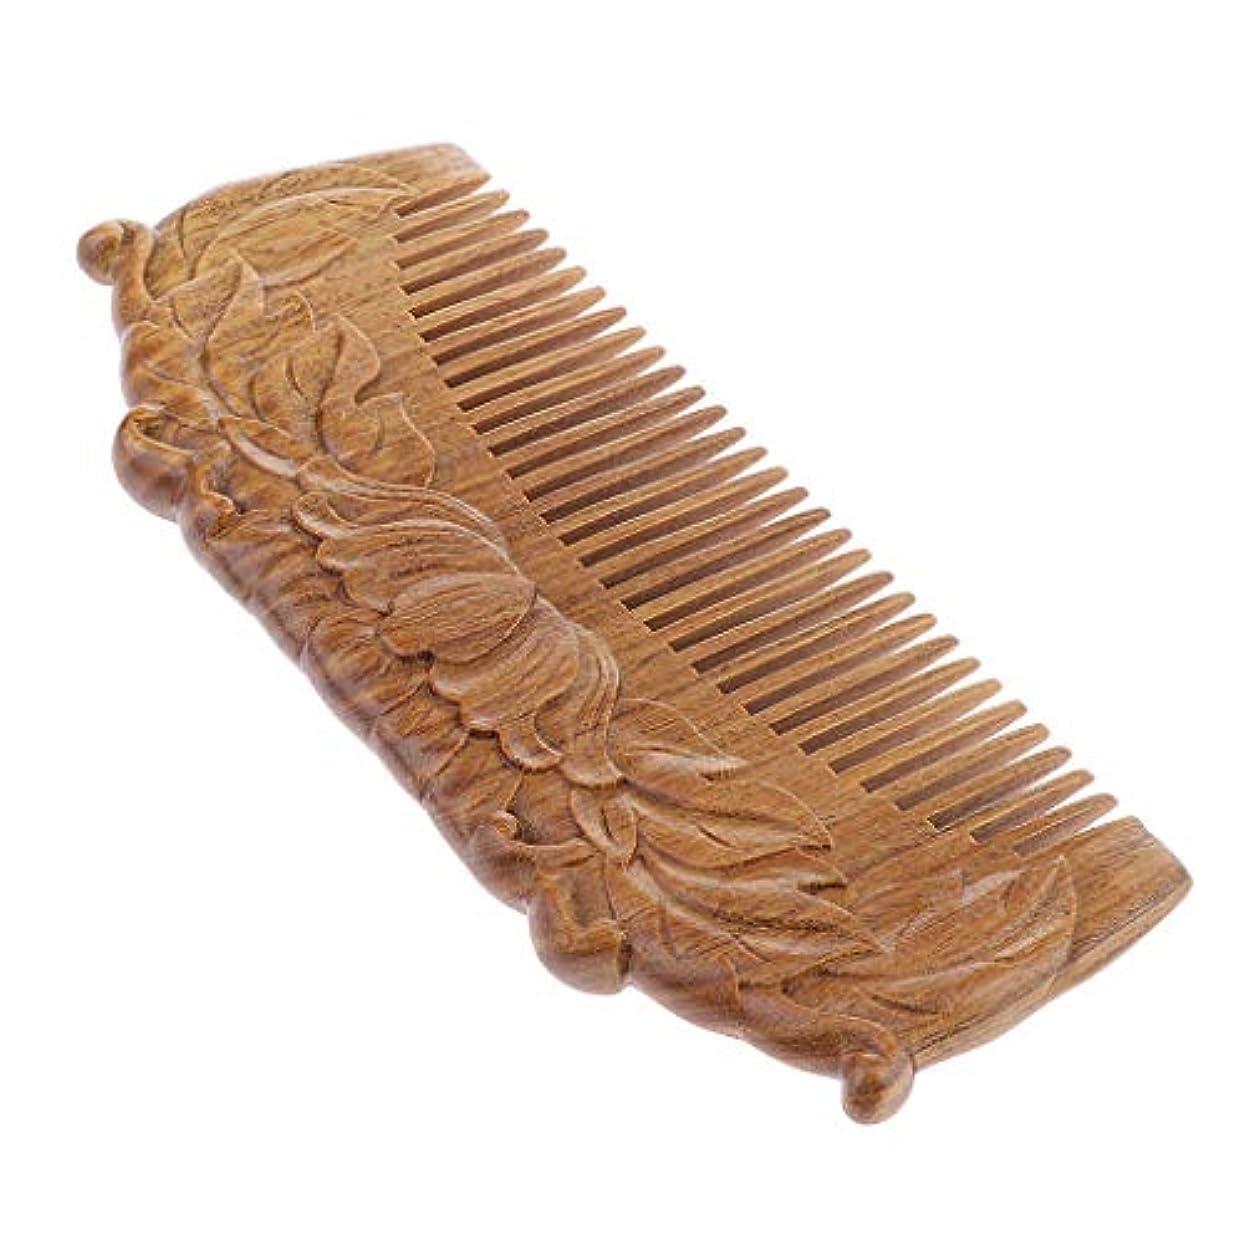 Toygogo ひげ、頭髪、口ひげの男性の女性のための刻まれたサンダルウッド木製くし帯電防止&暗礁なし手作りブラシ